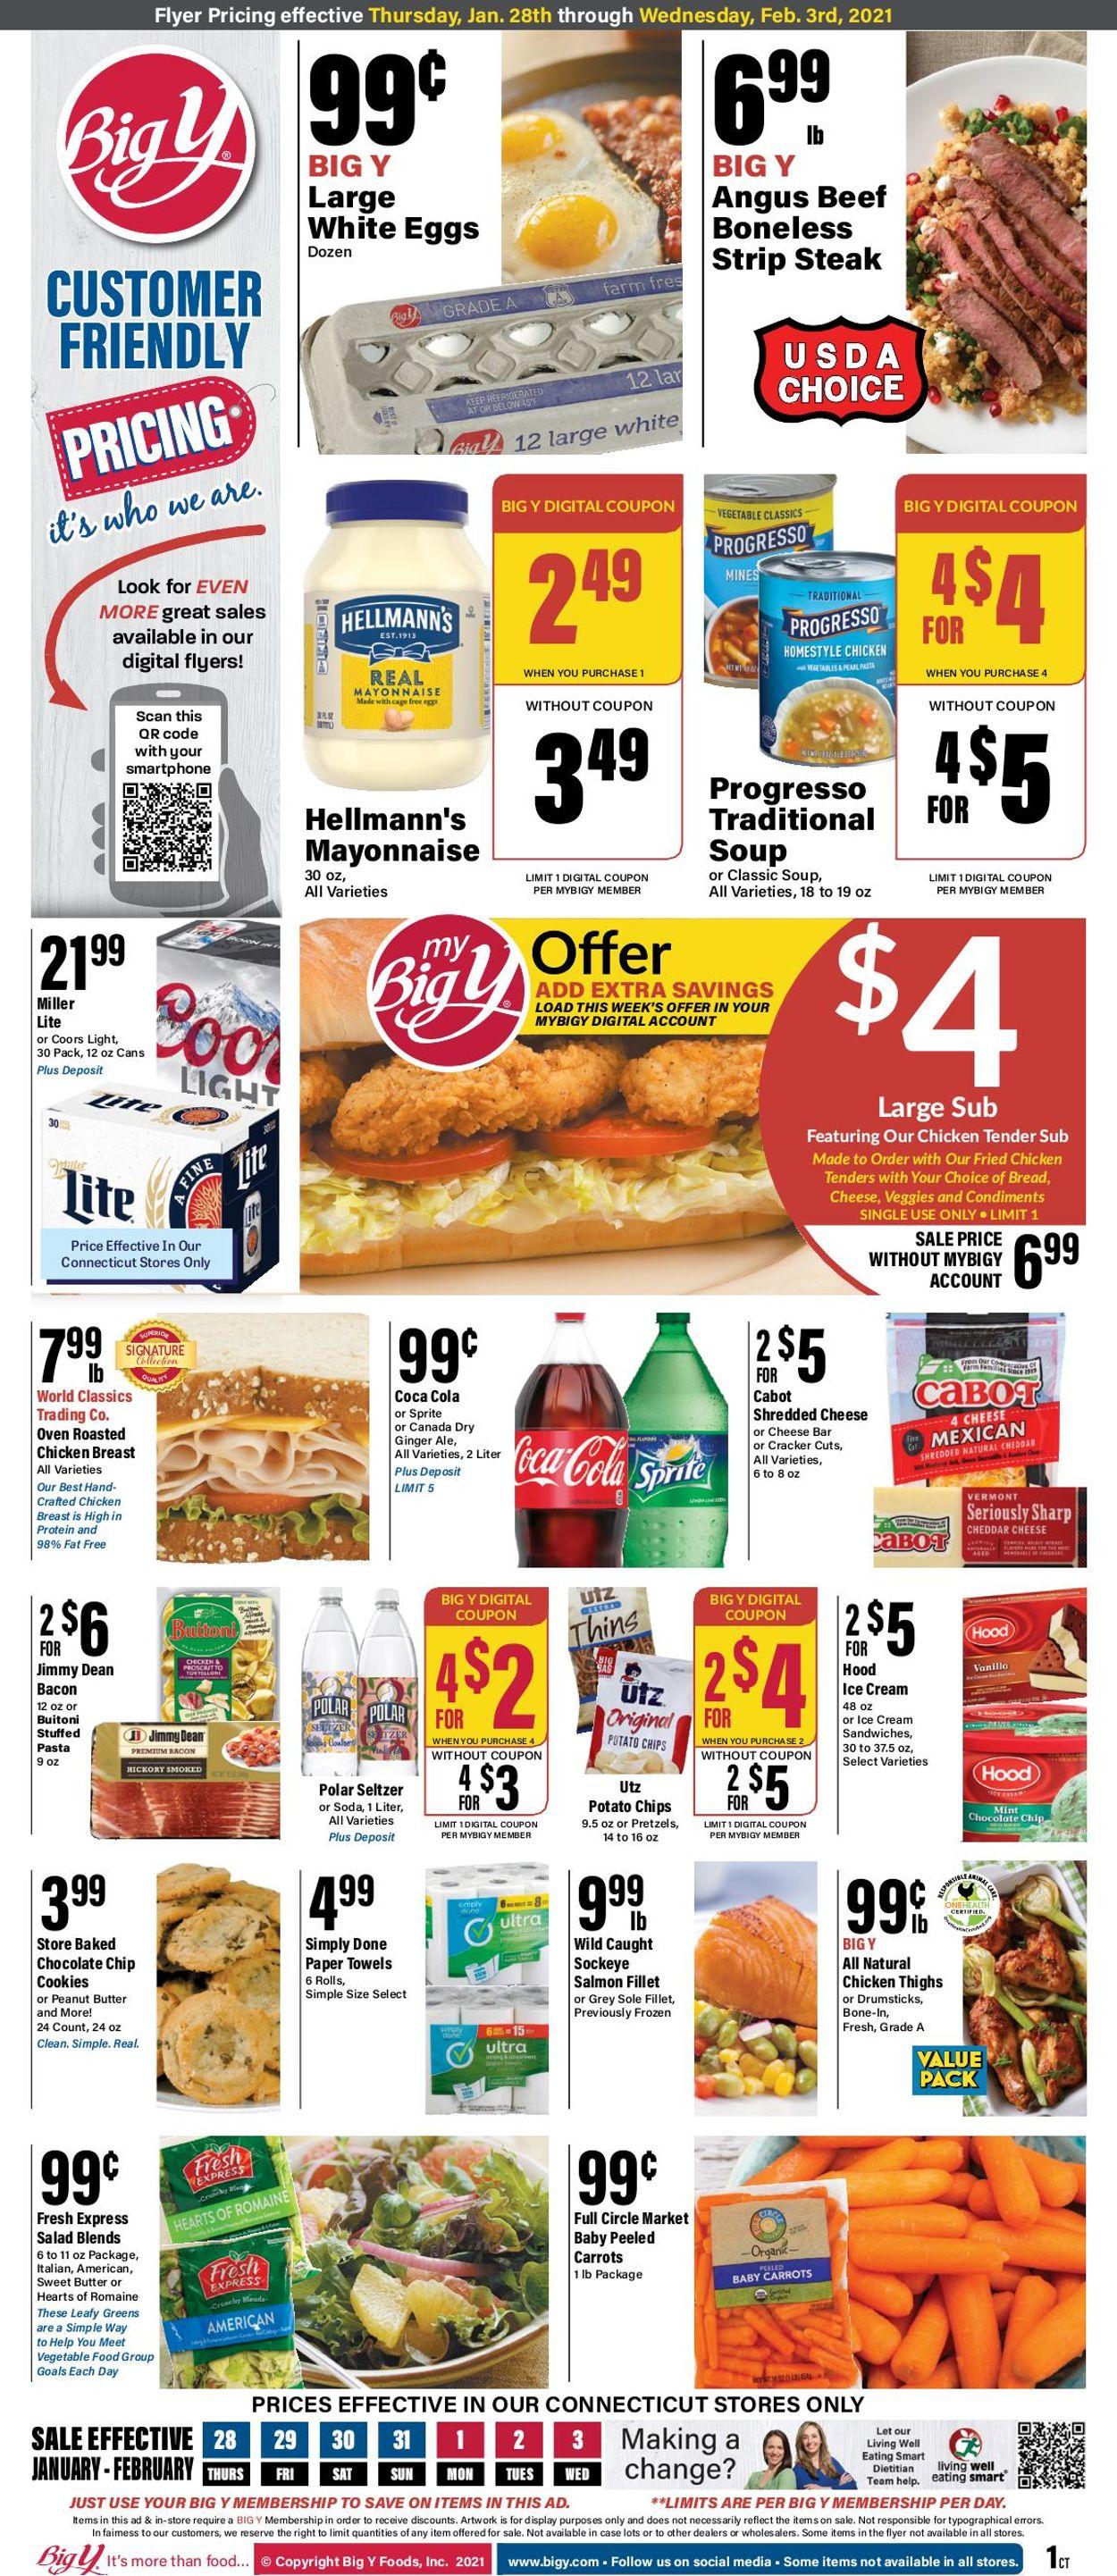 Big Y Weekly Ad Circular - valid 01/28-02/03/2021